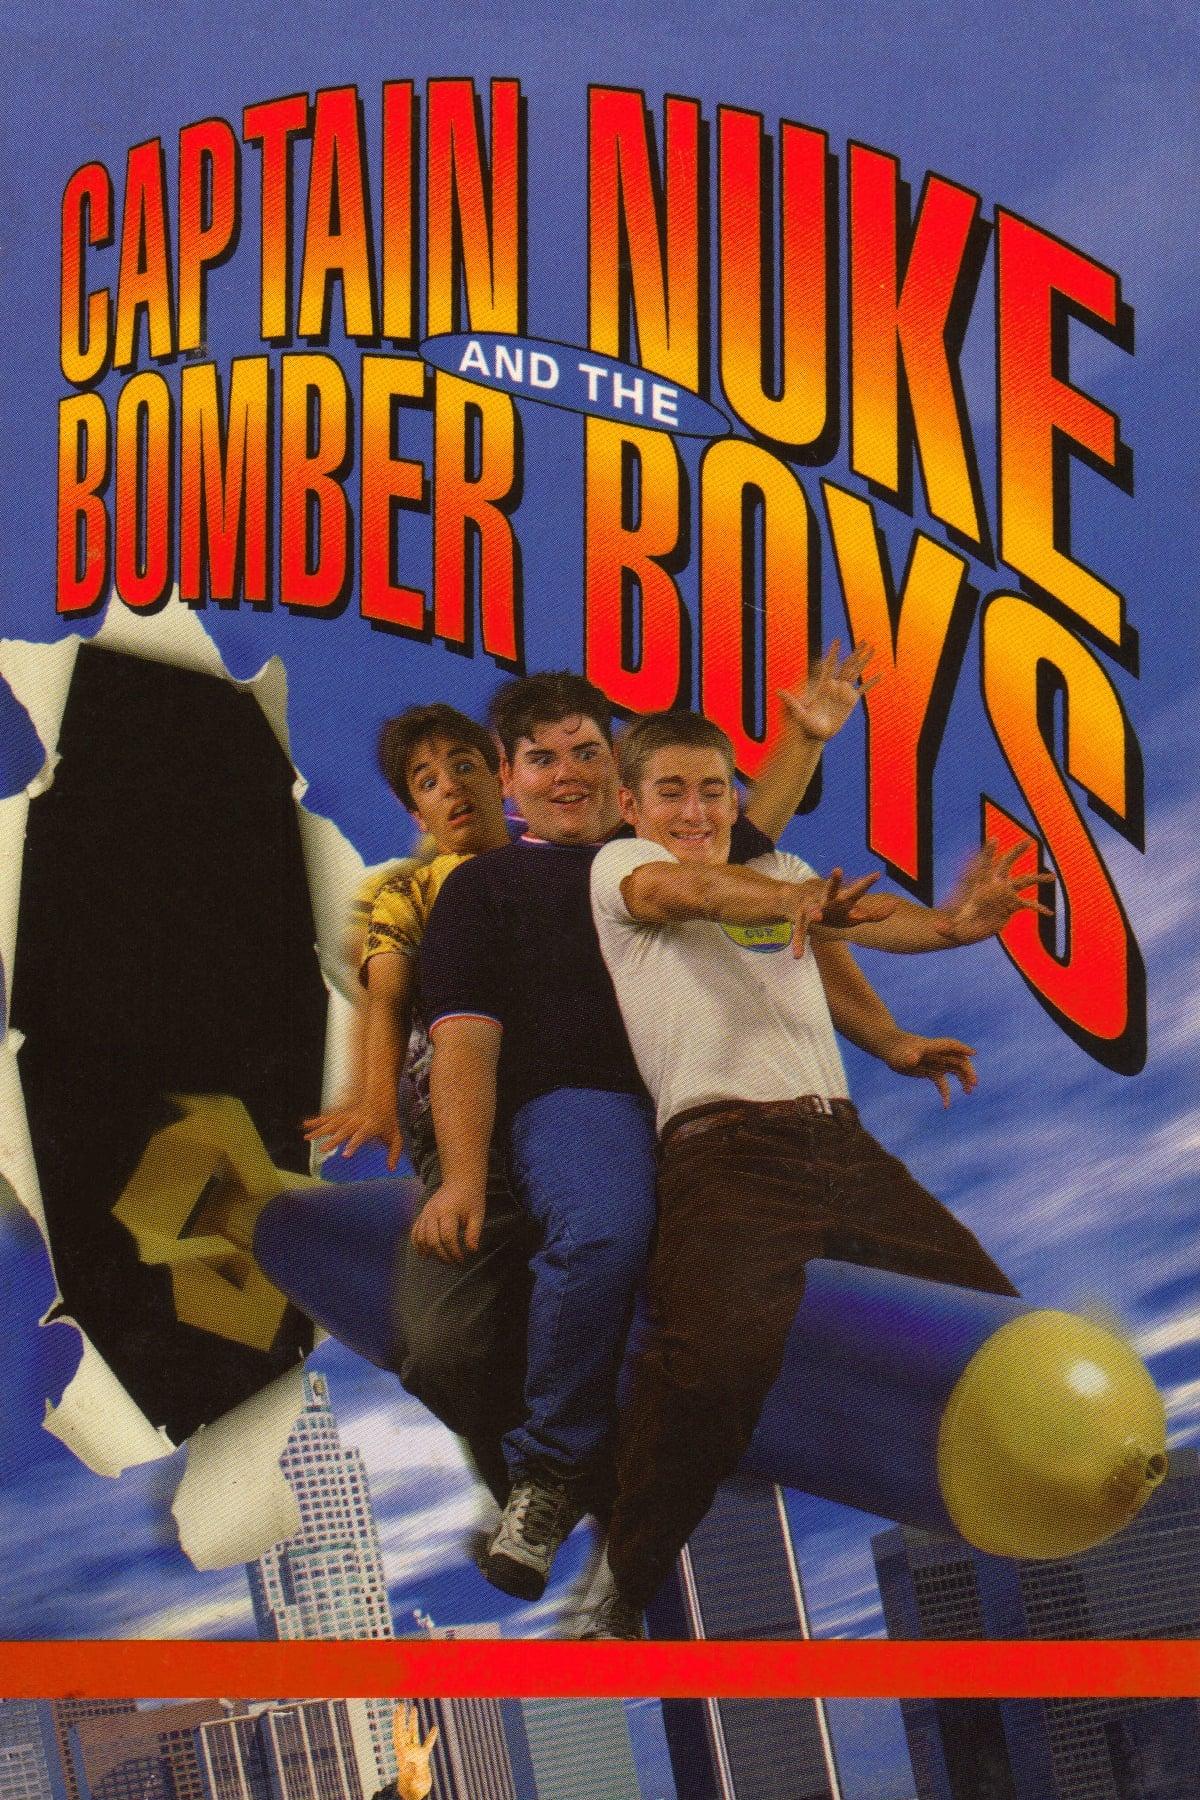 Captain Nuke and the Bomber Boys